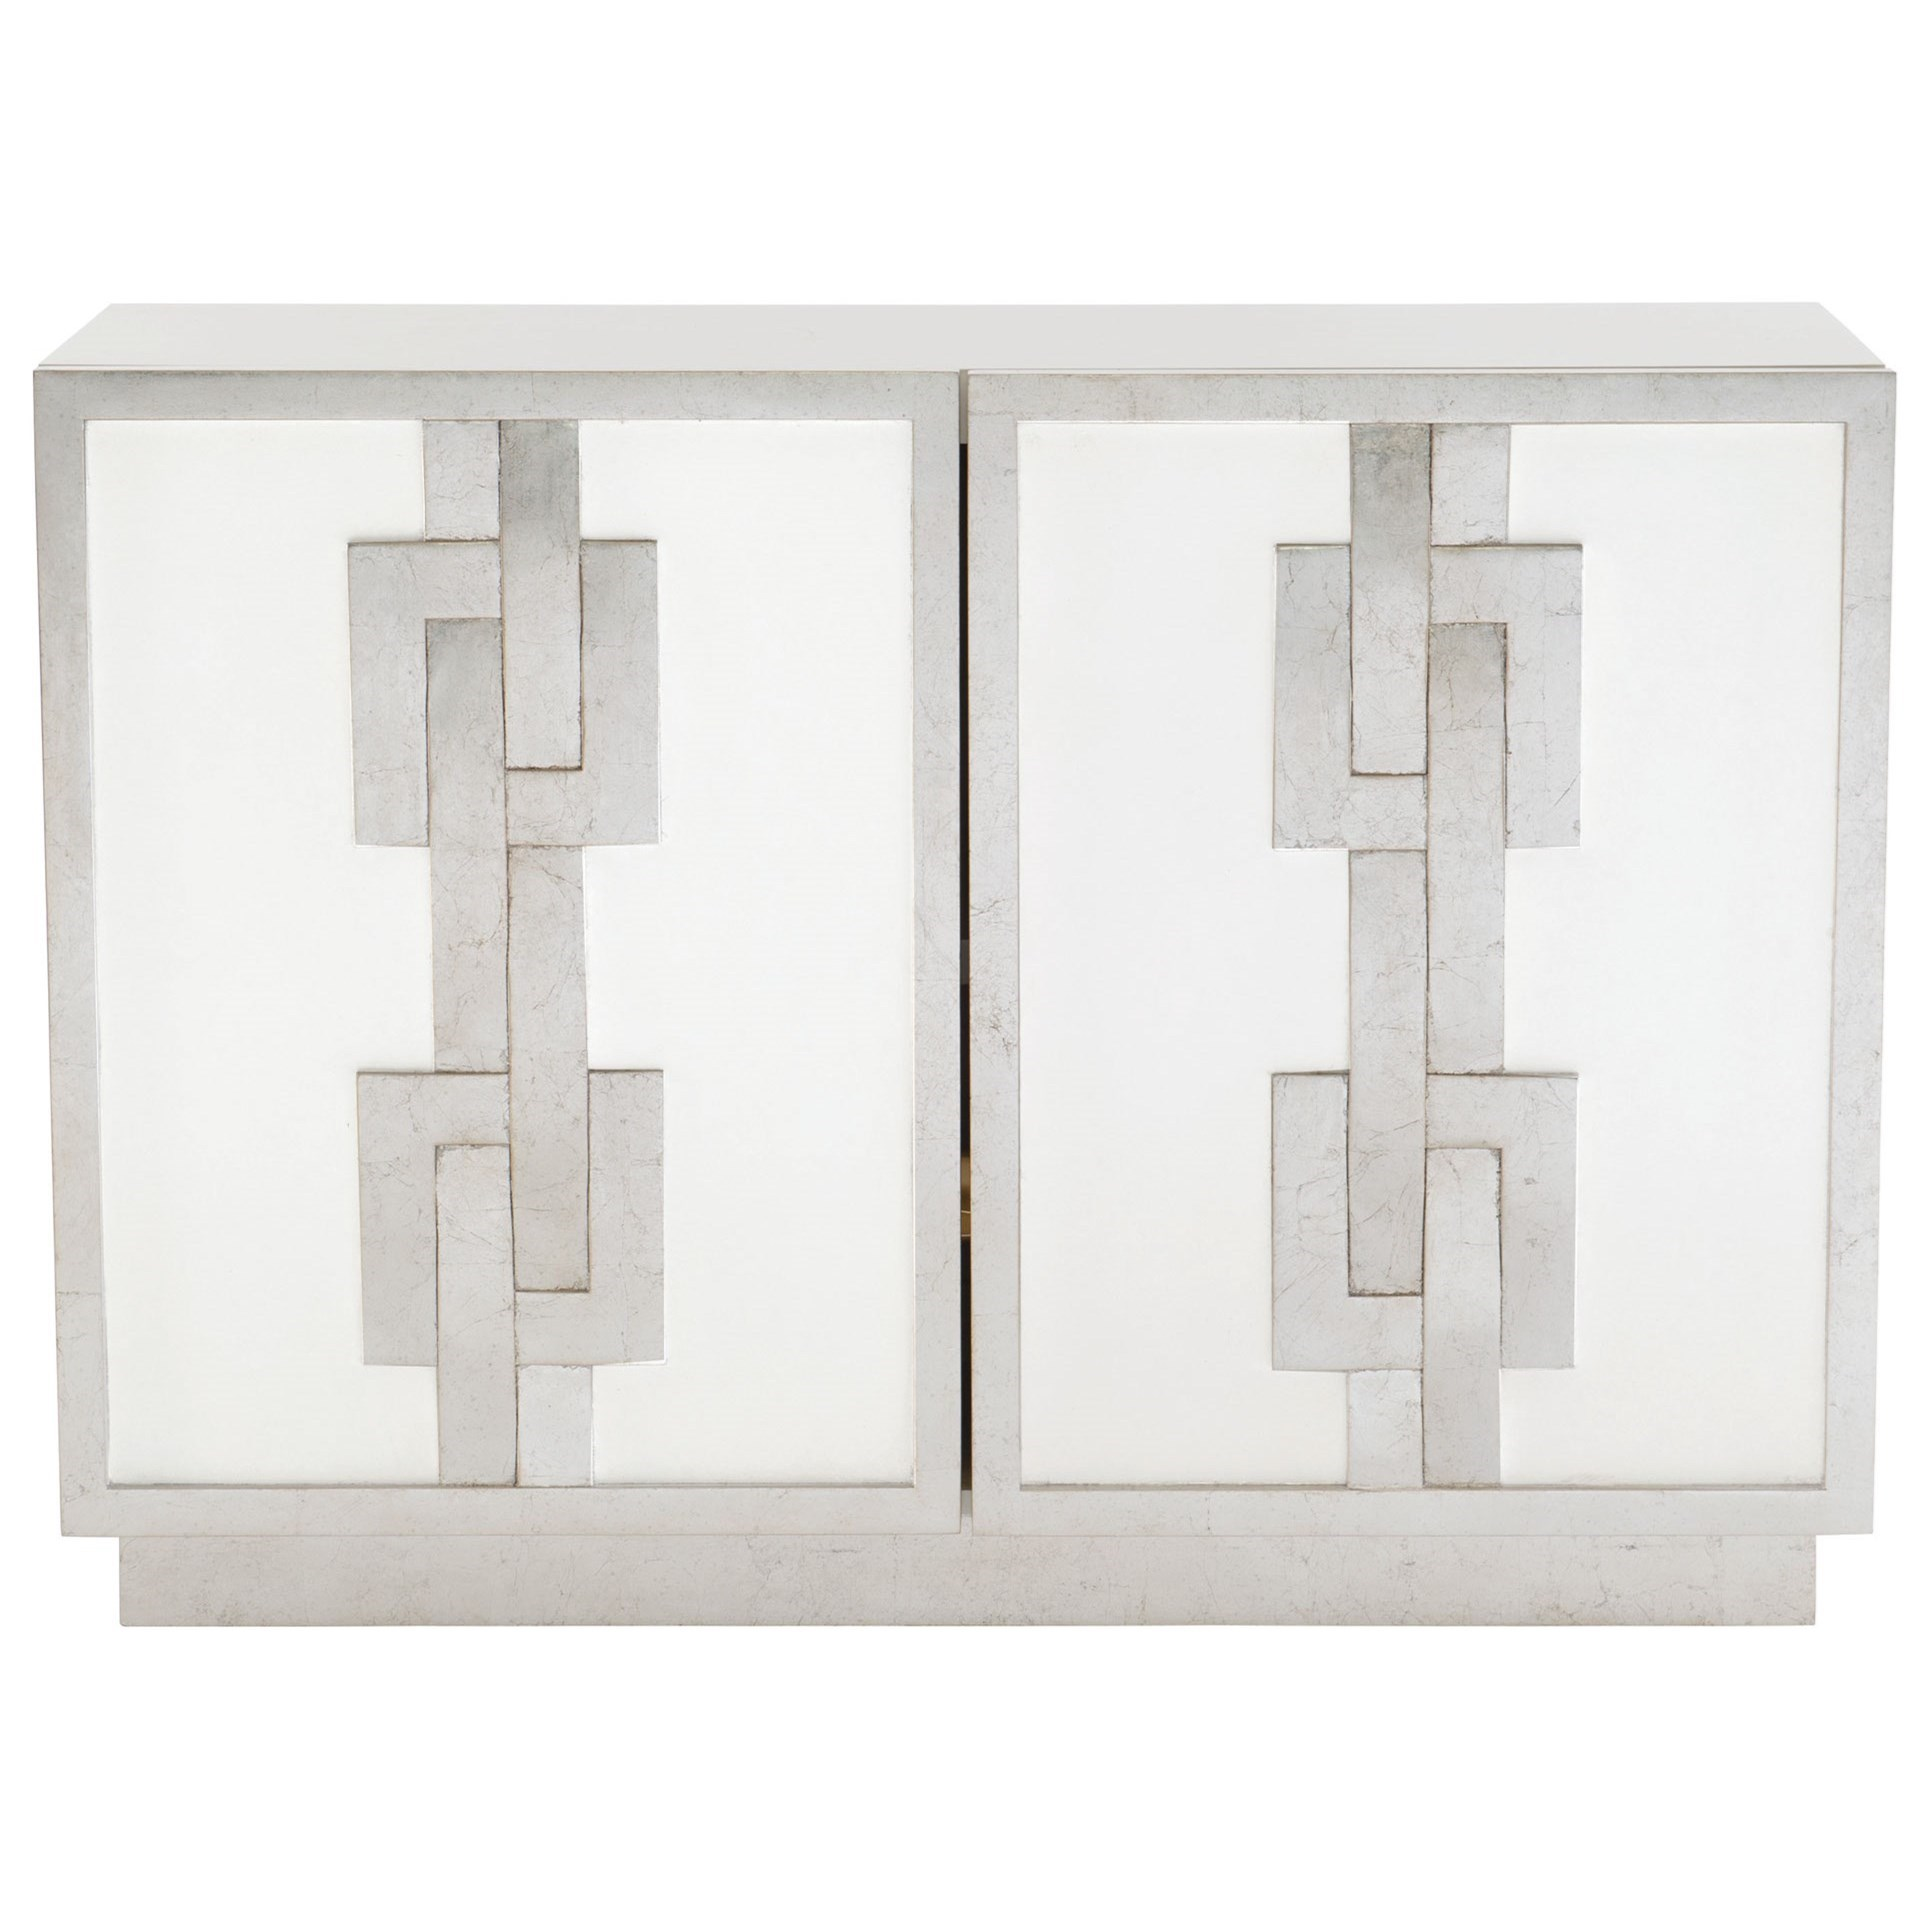 Interiors - Odell Door Chest by Bernhardt at Jacksonville Furniture Mart